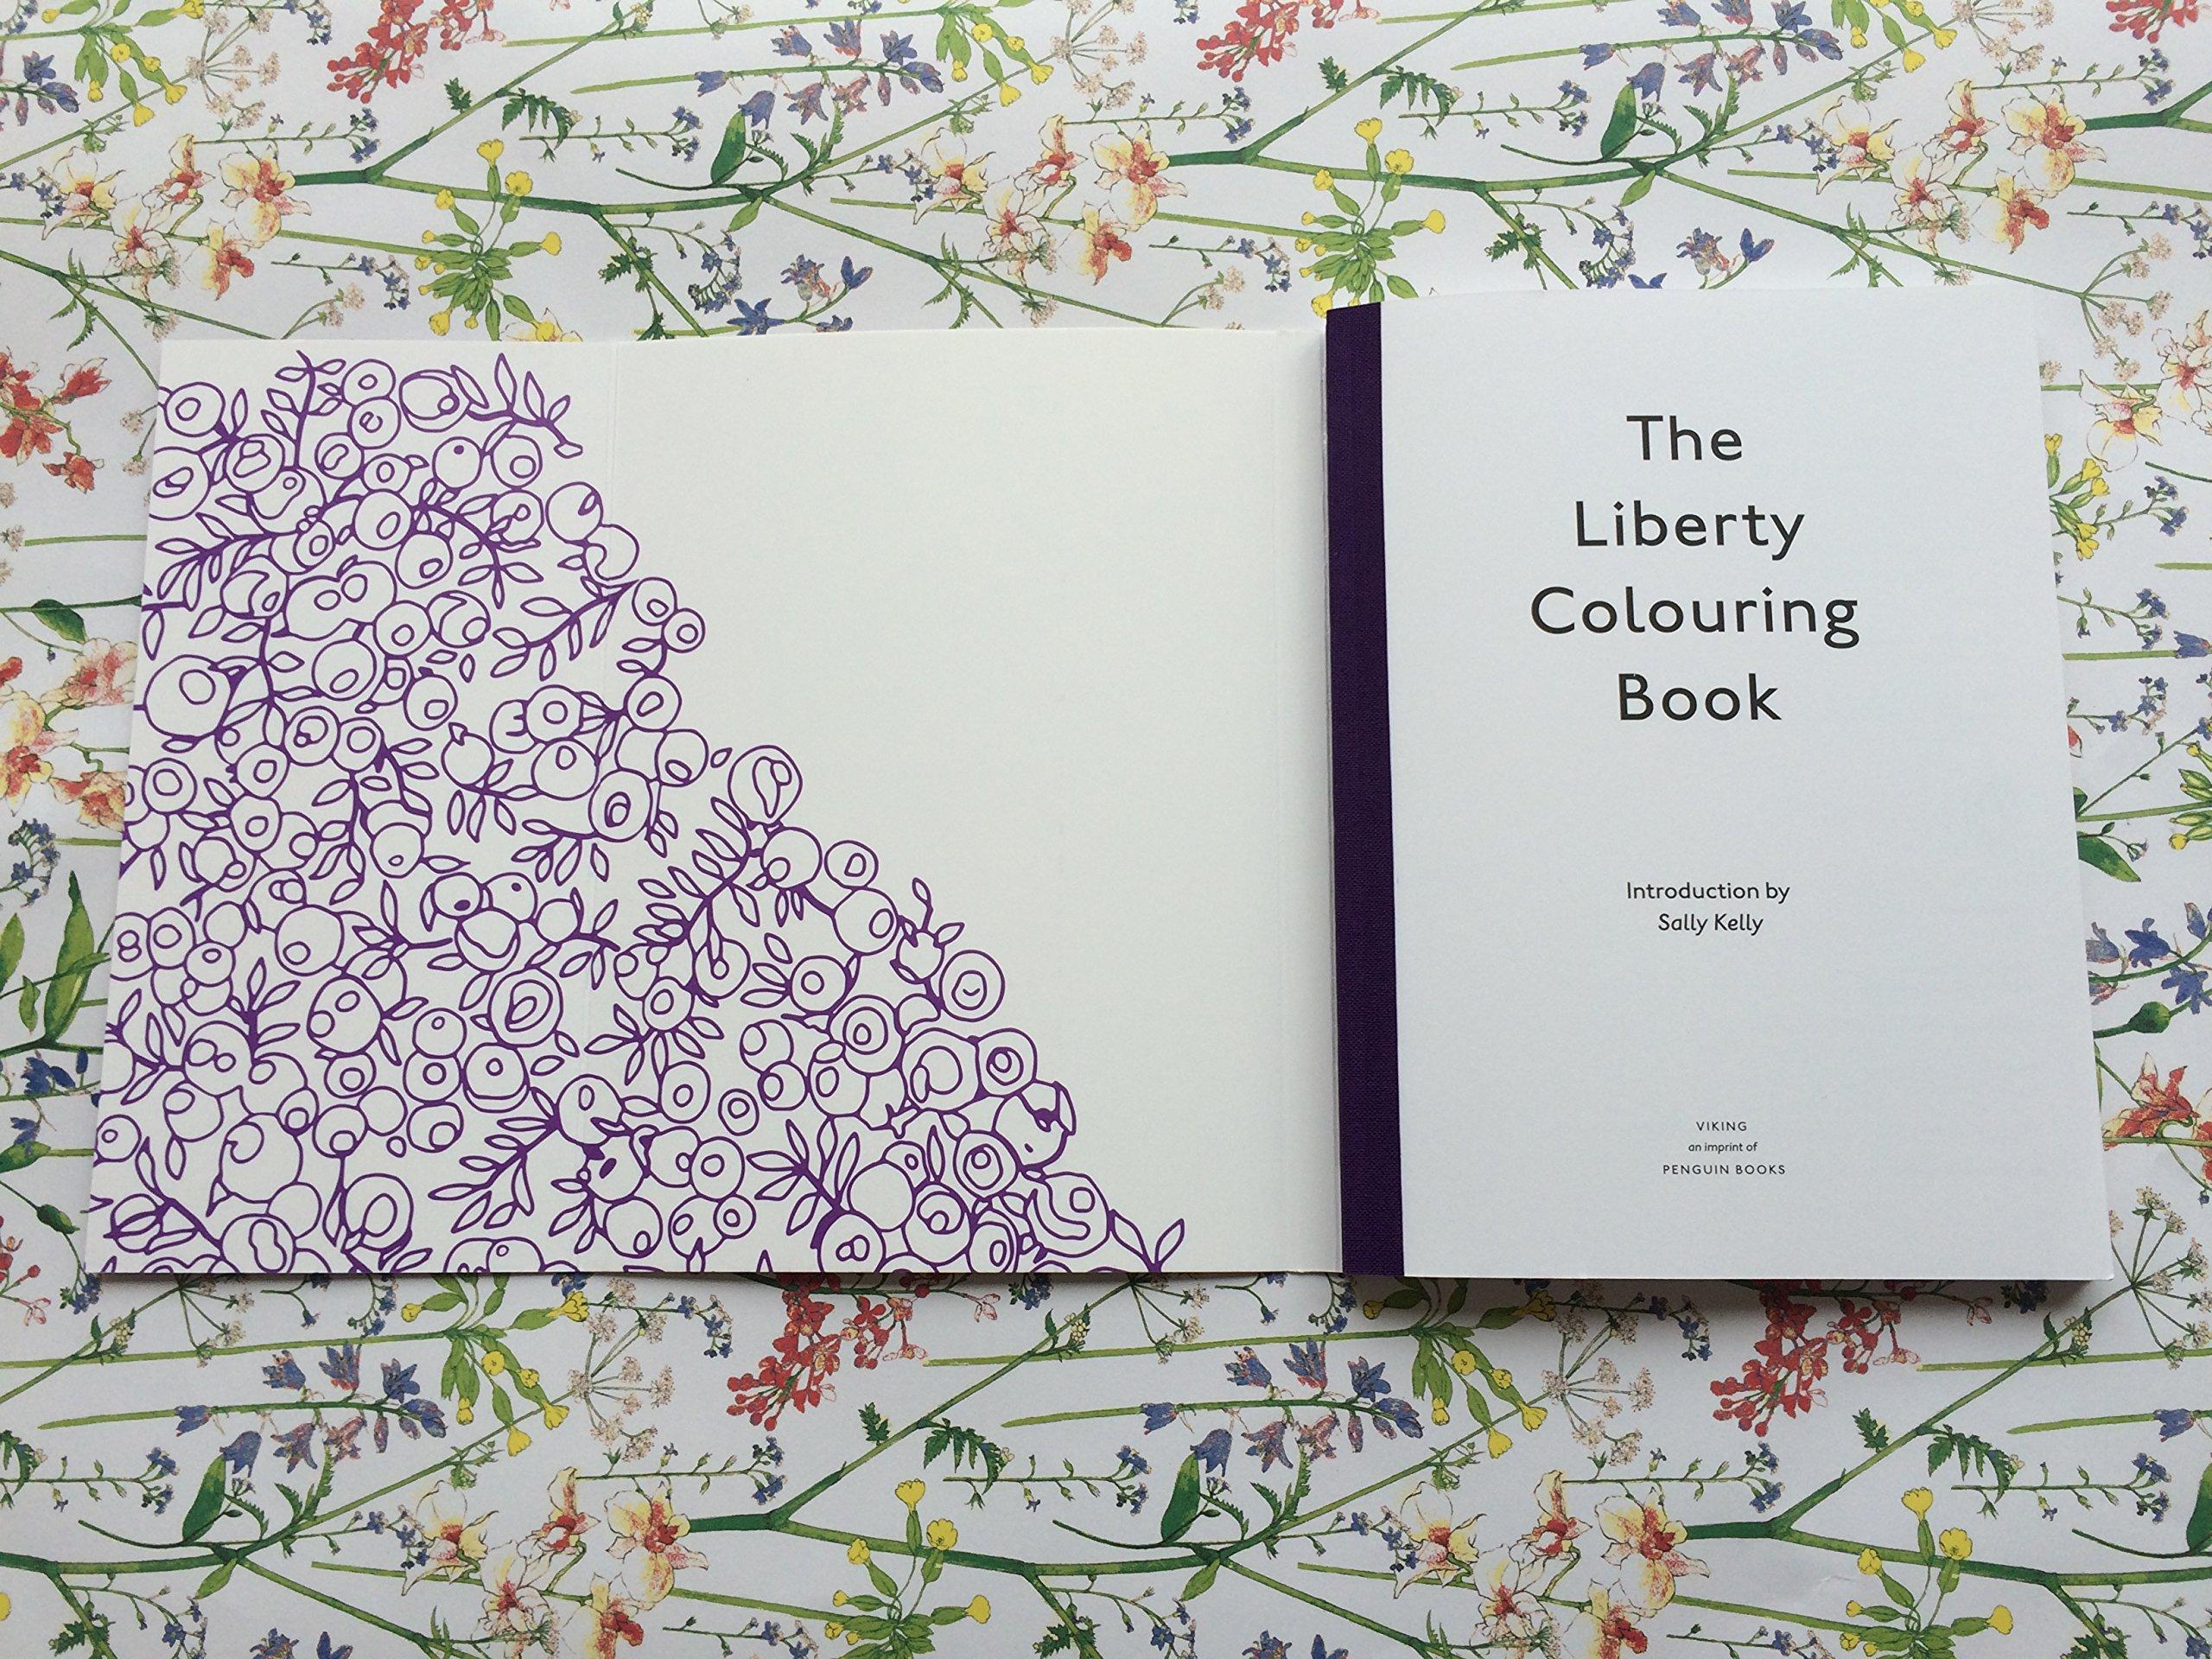 The Liberty Colouring Book: Amazon.co.uk: Liberty: 9780241249987: Books